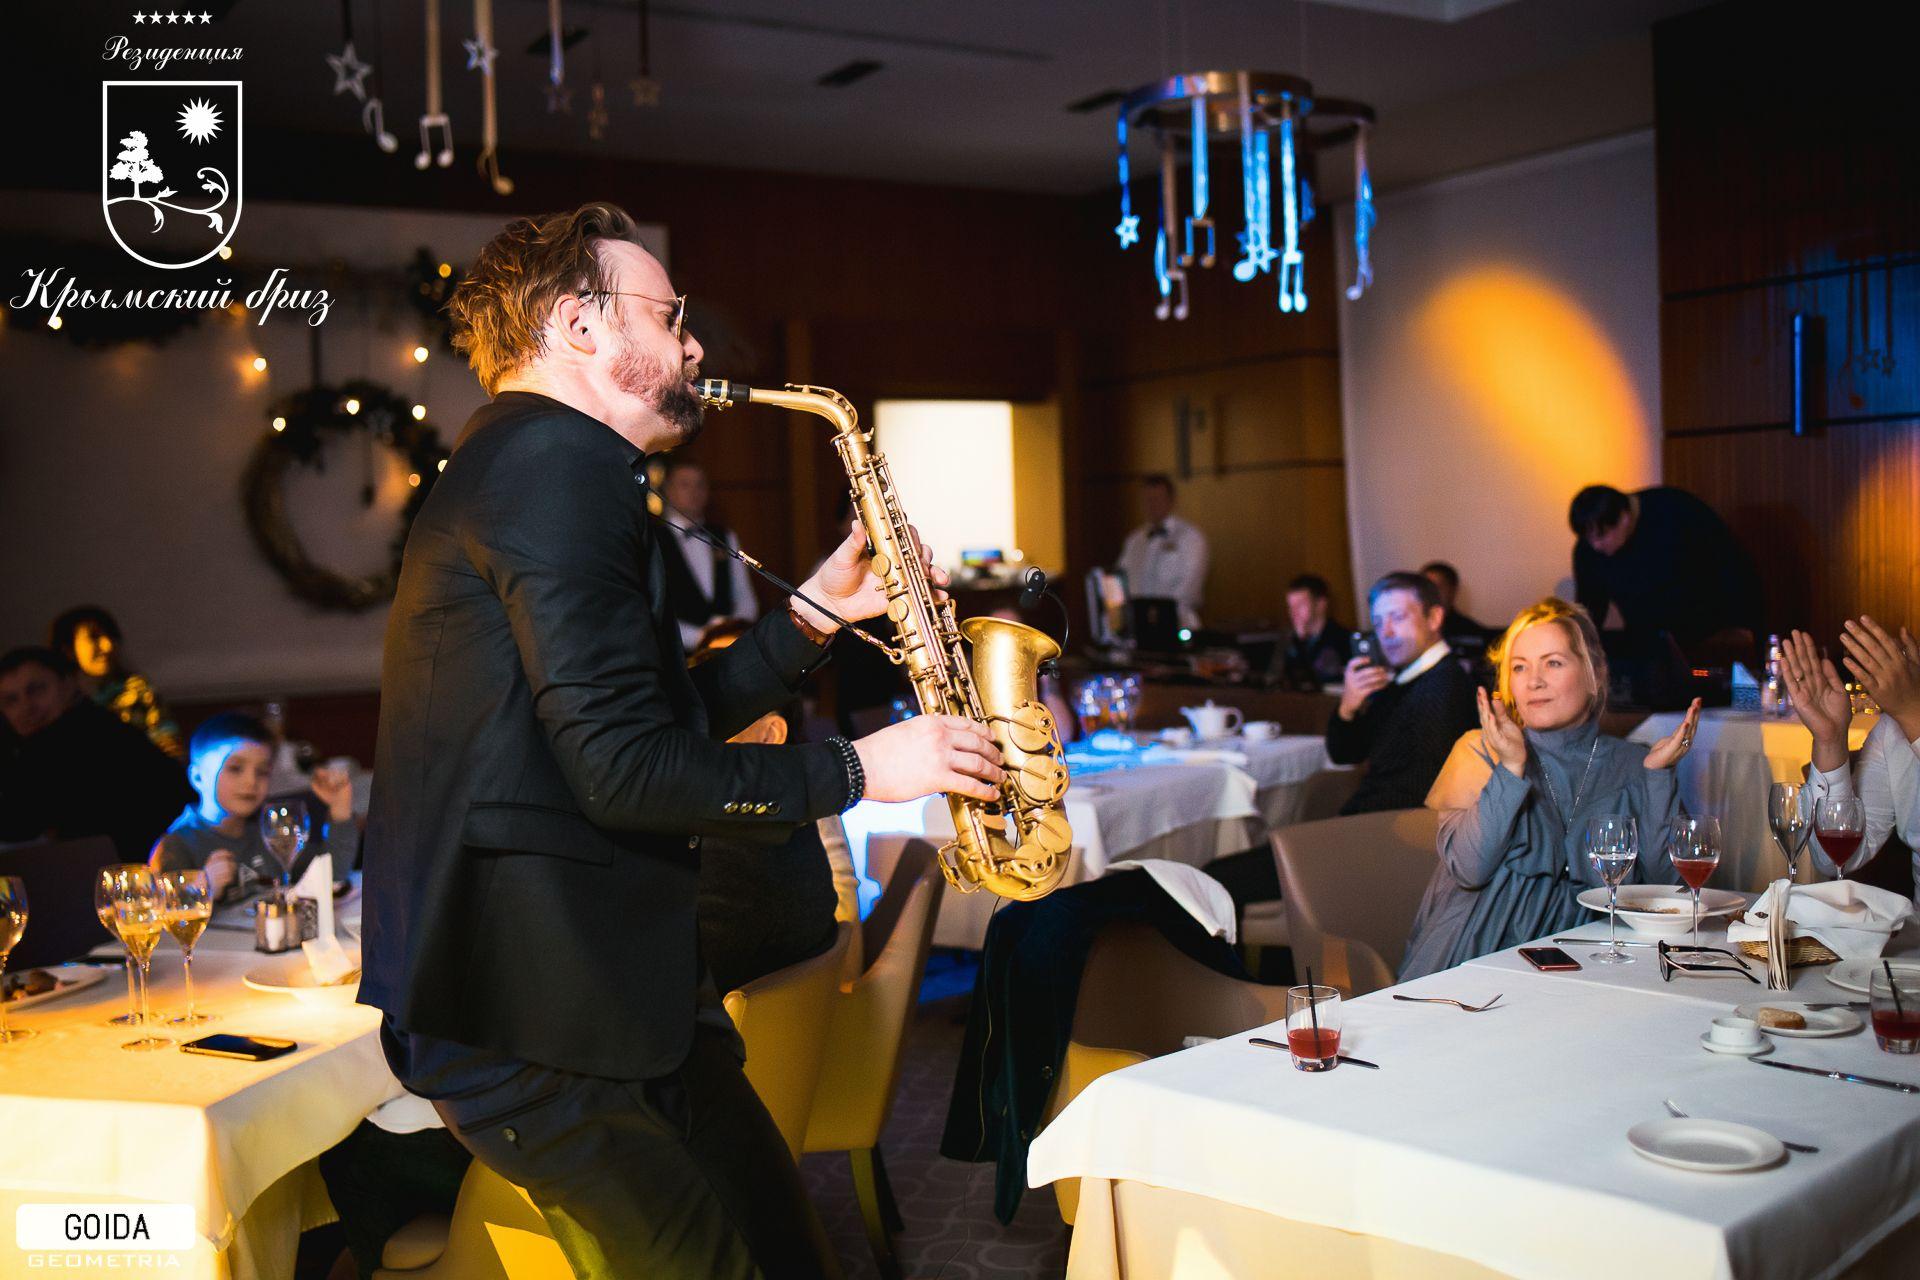 Легендарный саксофонист-виртуоз, мастер джазовых импровизаций - MAX THE SAX